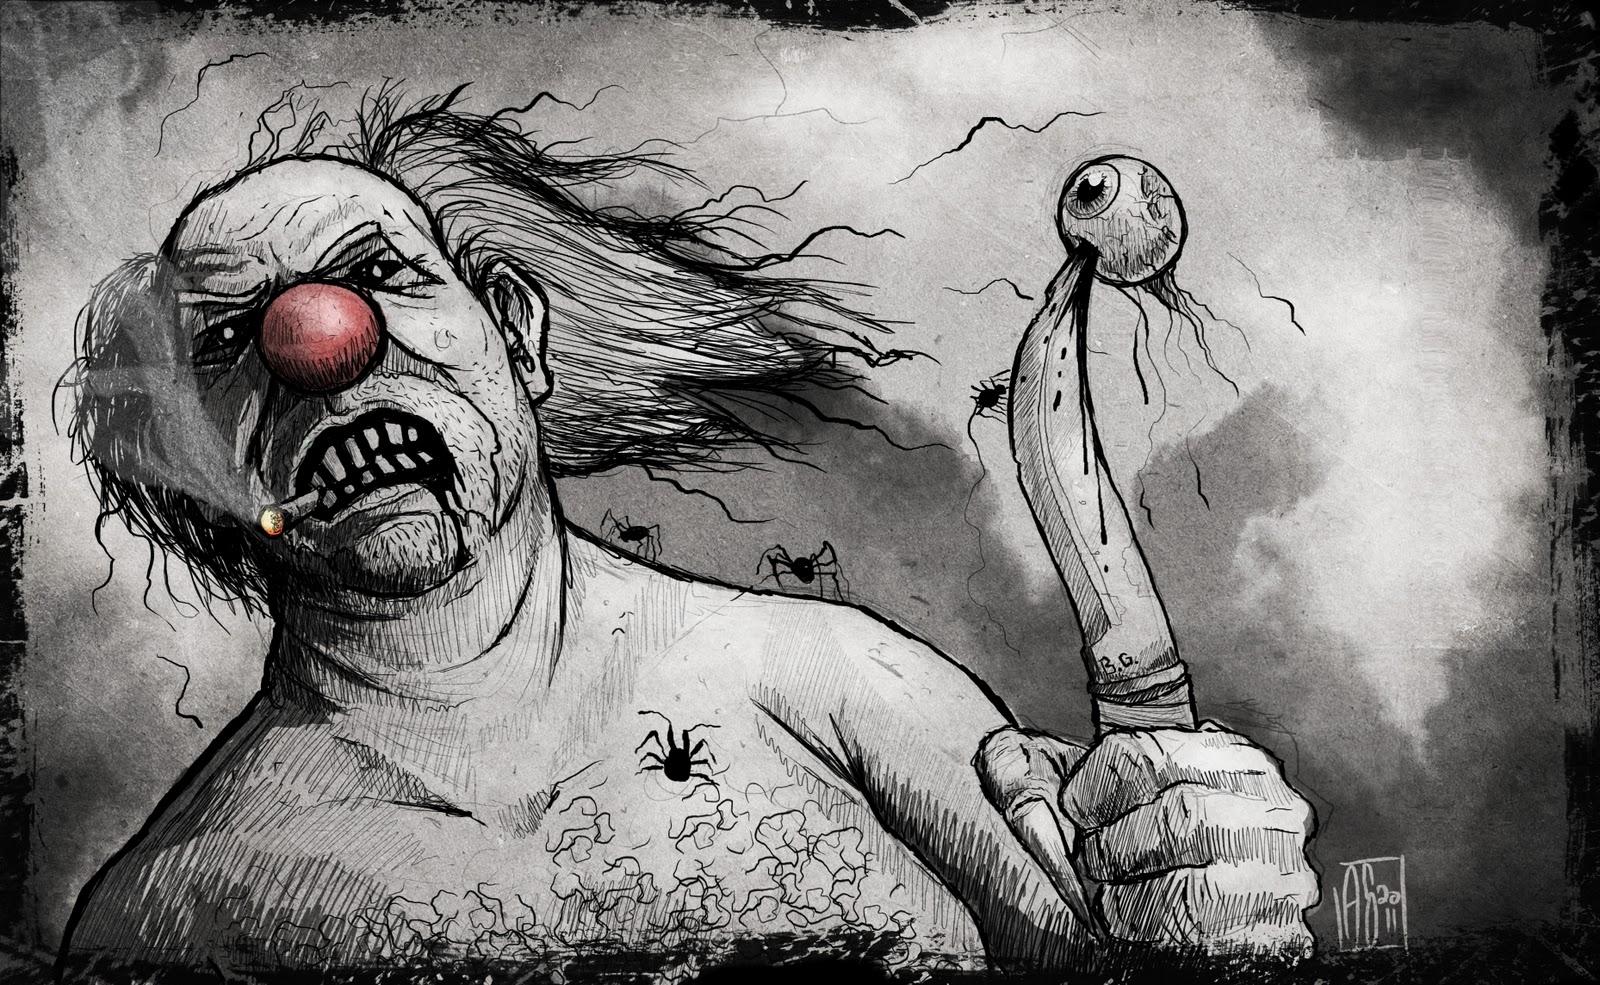 anthony sixto art blog halloween challenge day 4 clown halloween challenge day 4 clown